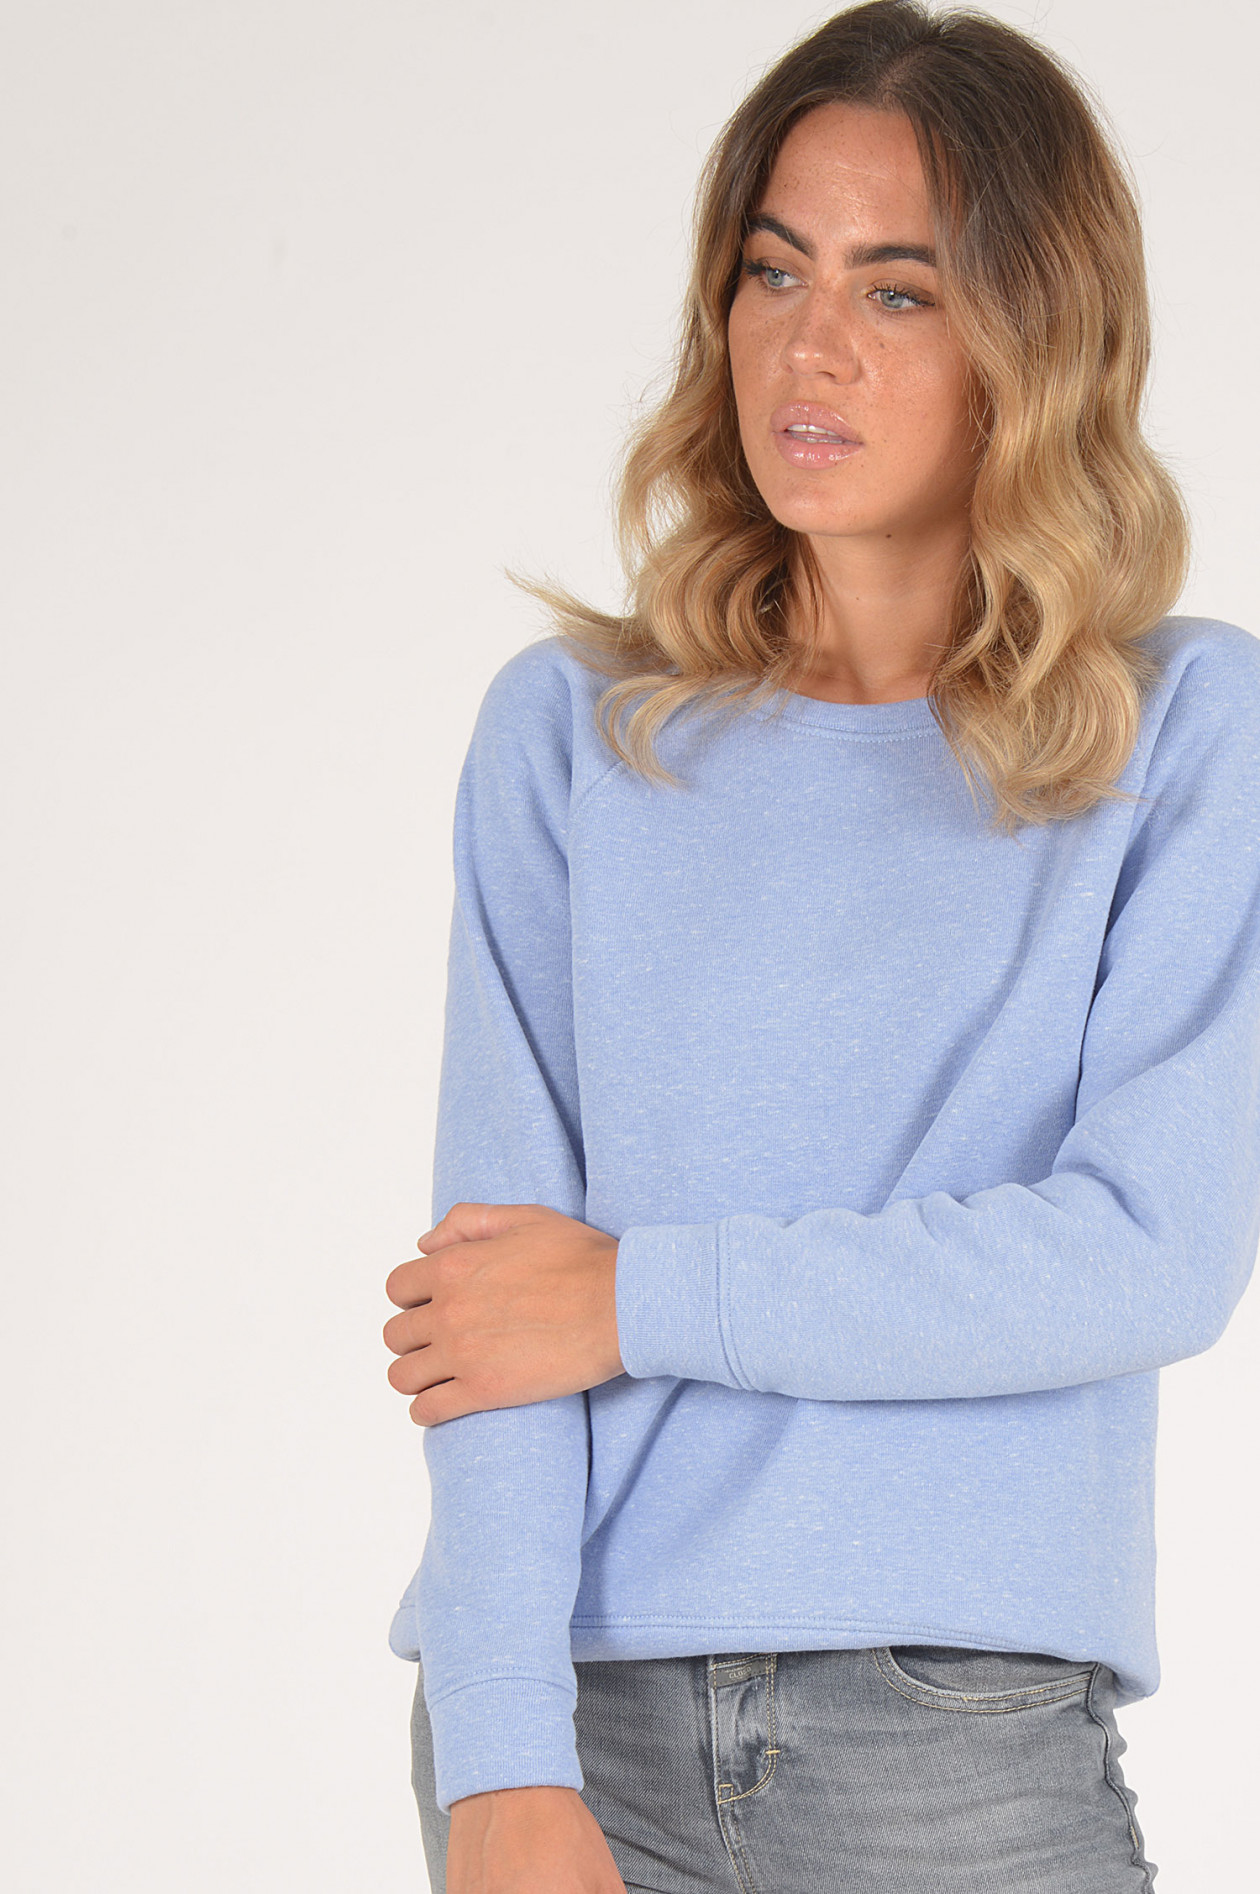 Closed Sweater in Blau meliert | GRUENER.AT